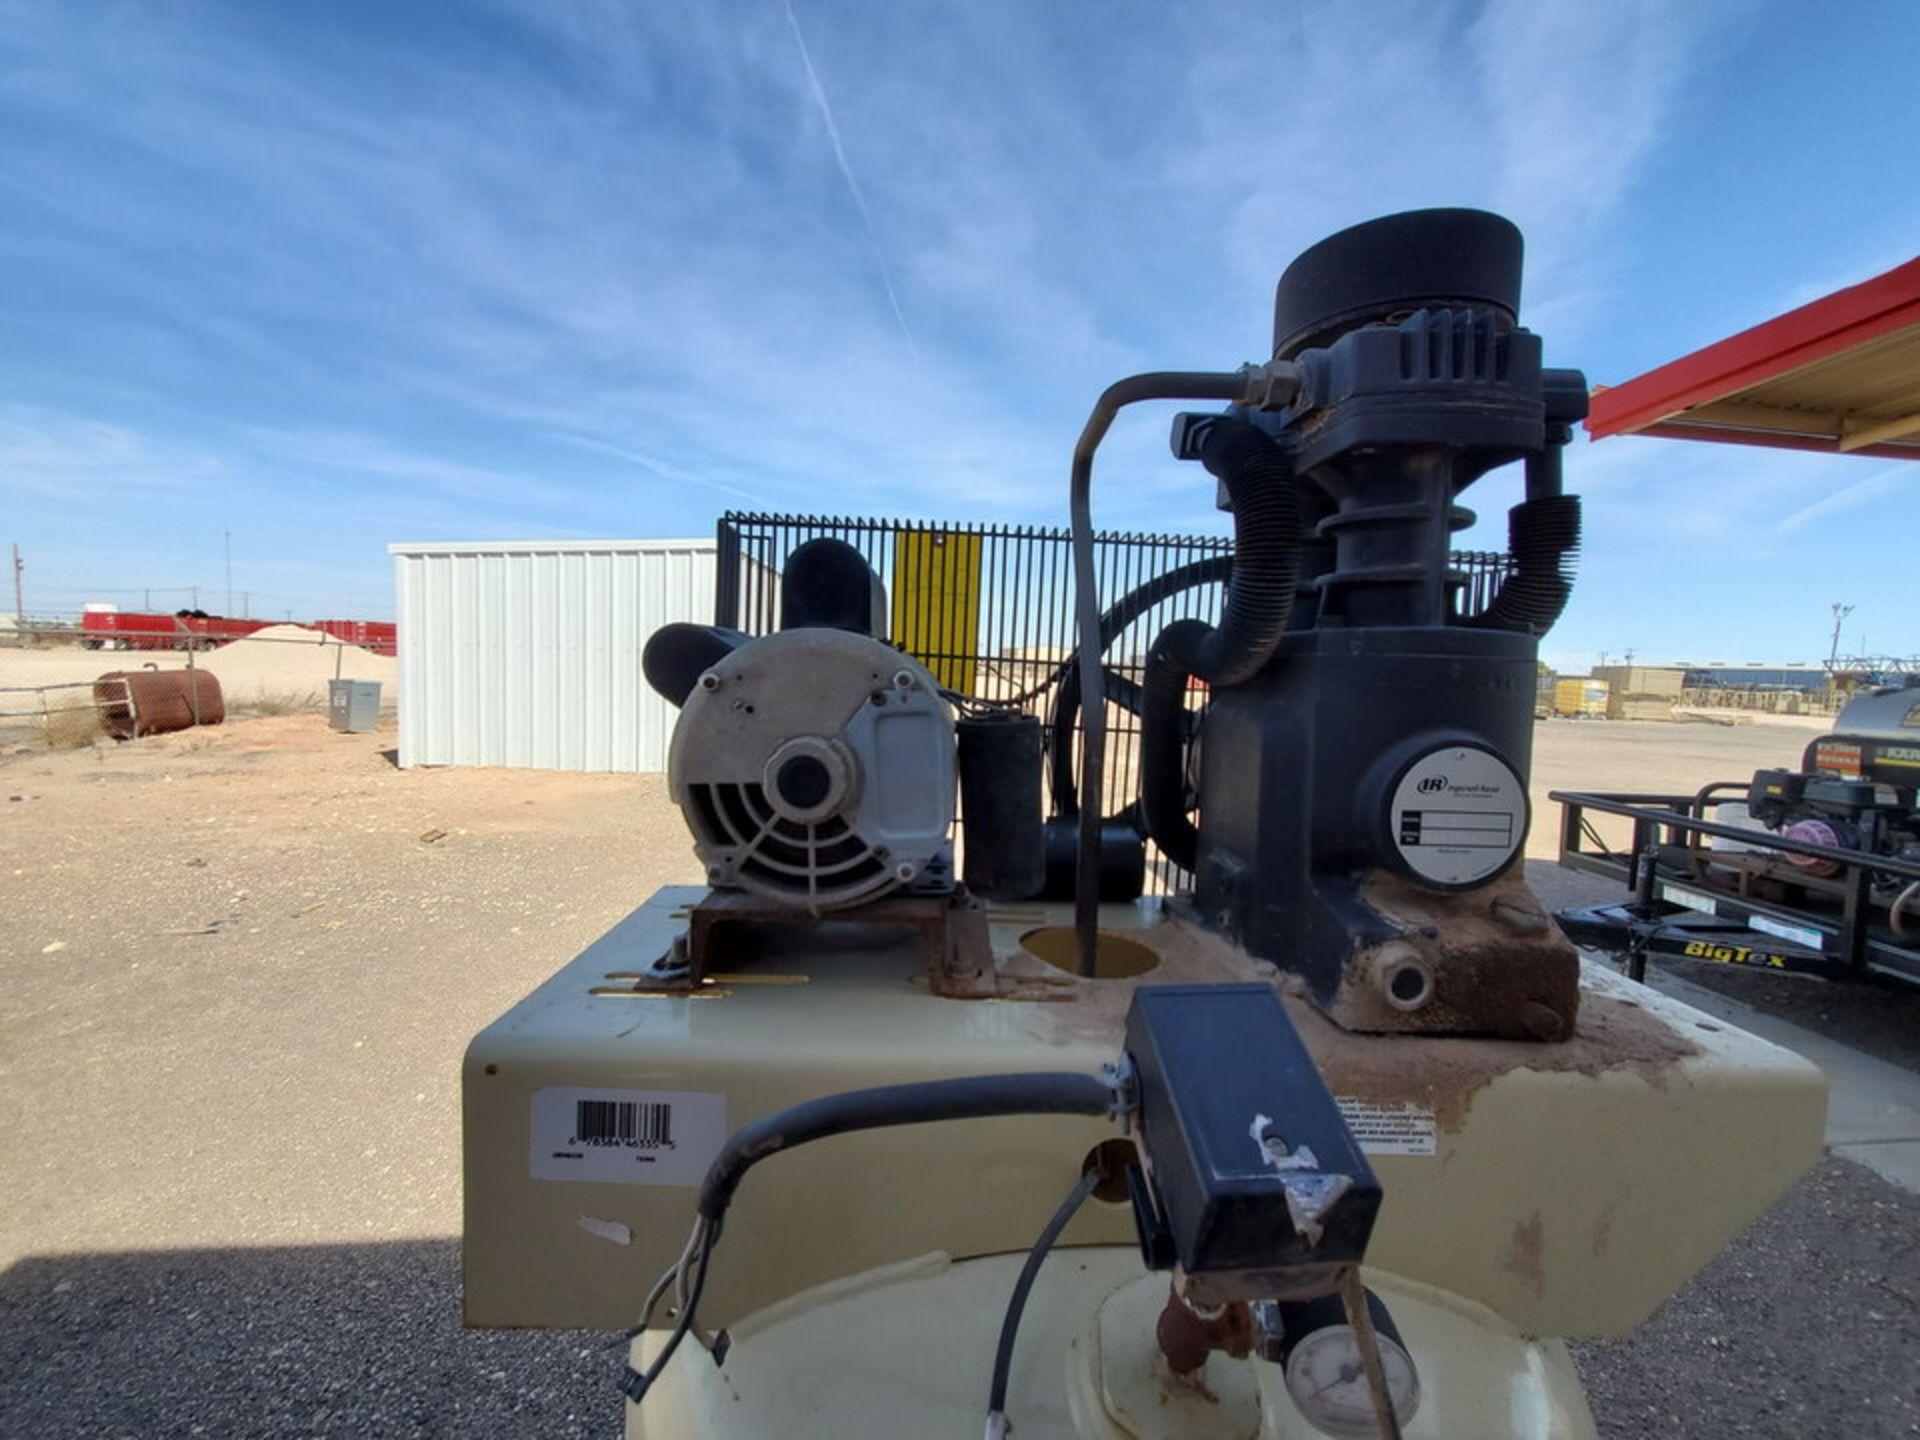 IR TS4N5 Air Compressor 230V, 1PH, 60HZ, MAWP-175psi - Image 8 of 9